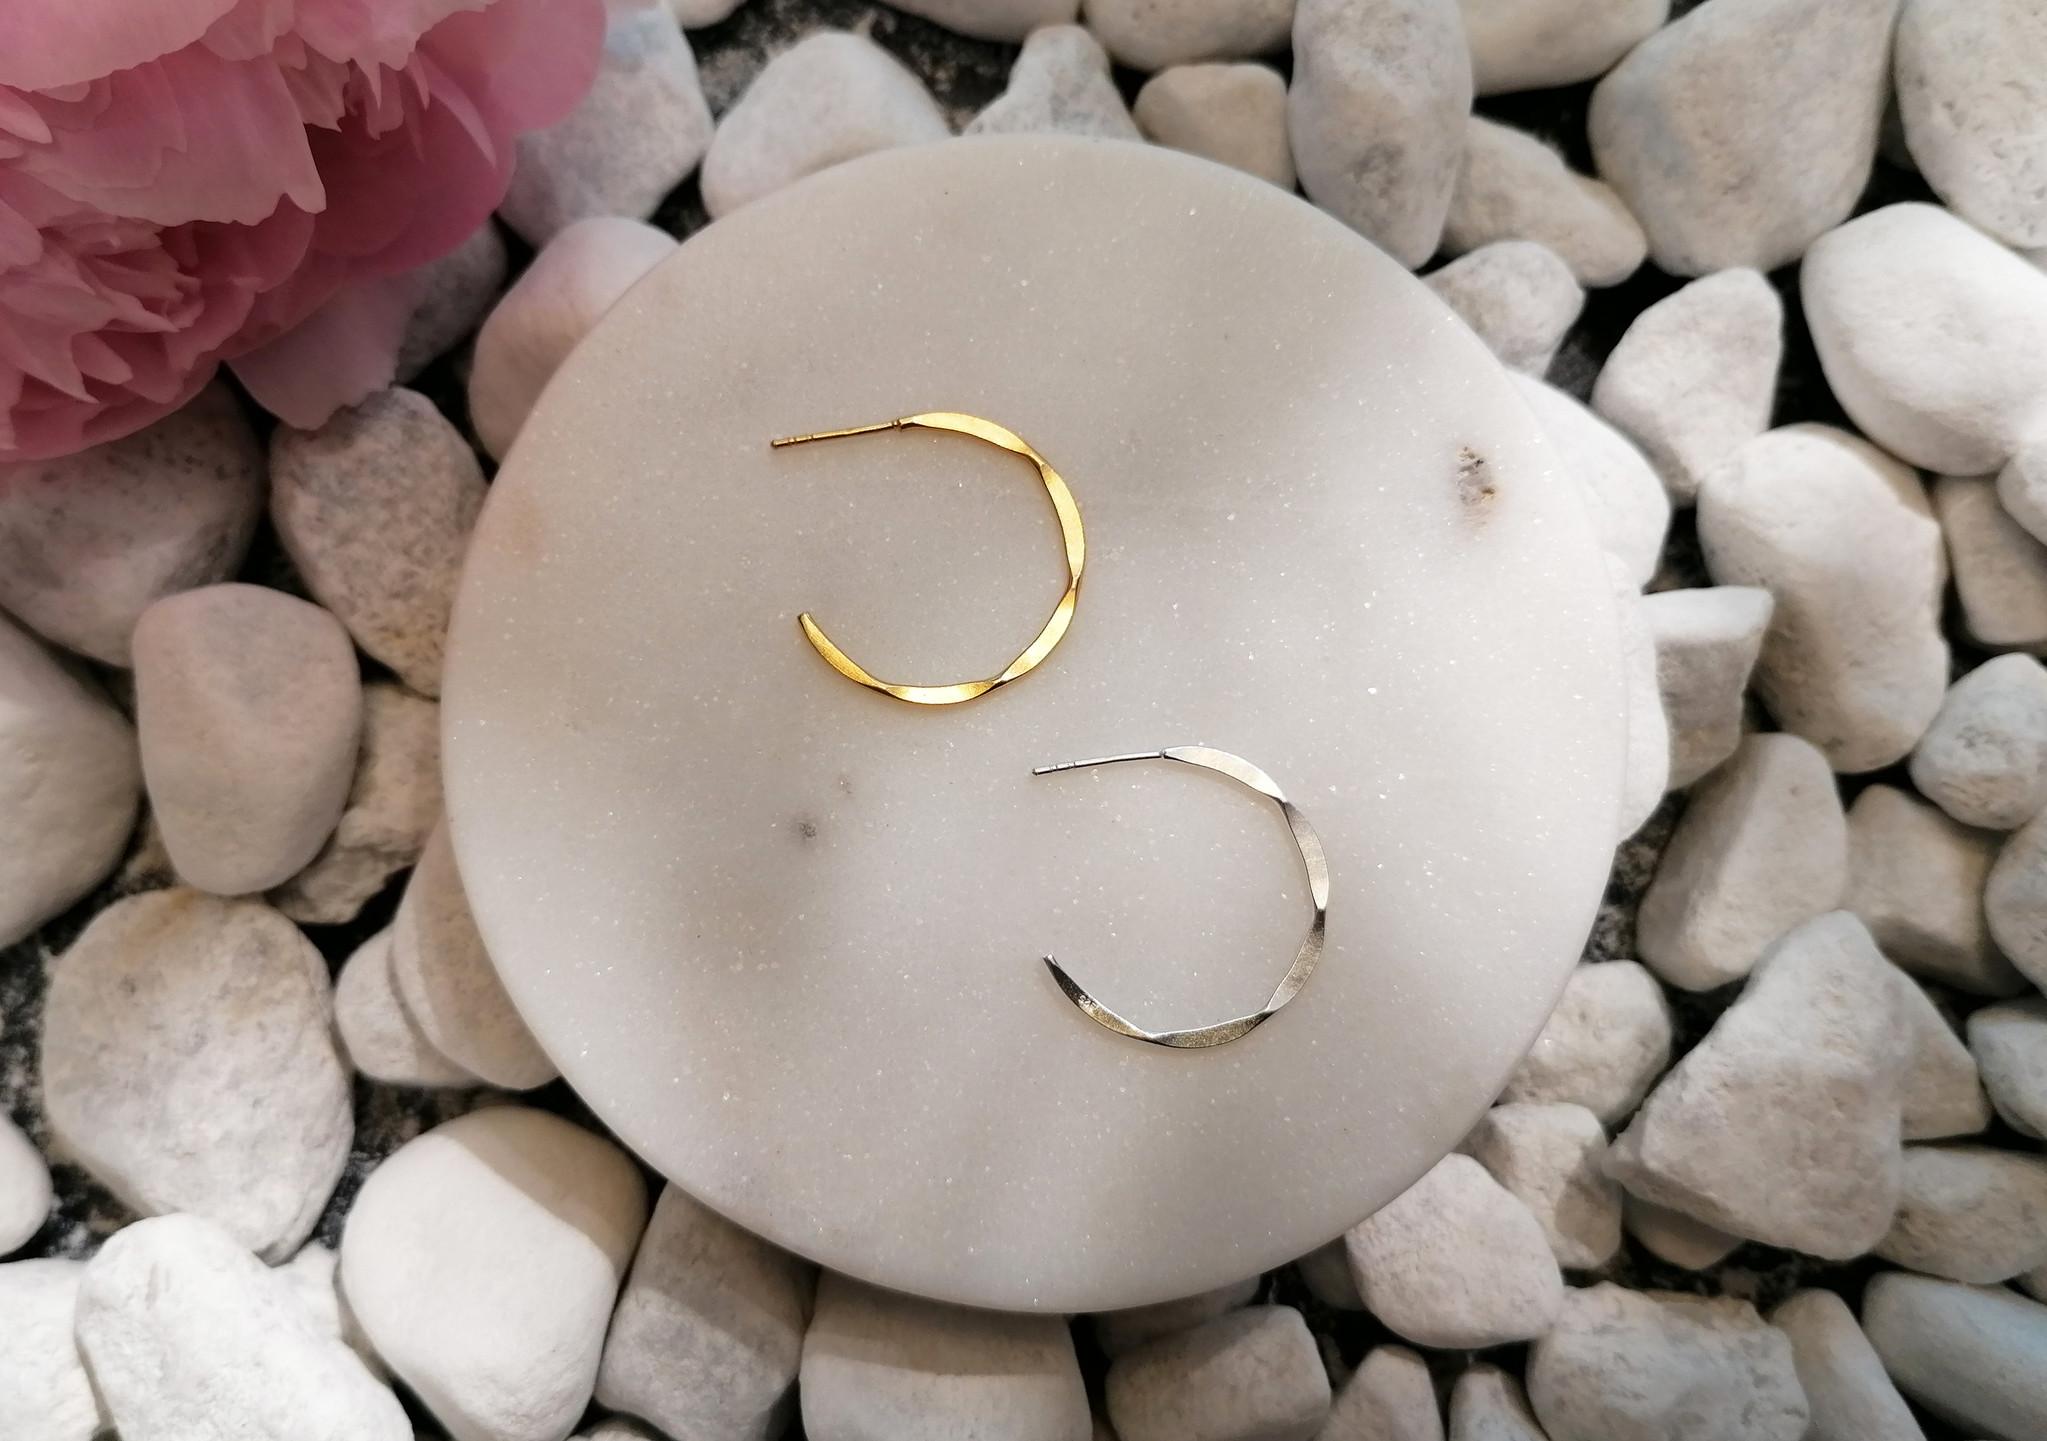 Large Hoop Earrings with texture - 925er Sterling Silver-6